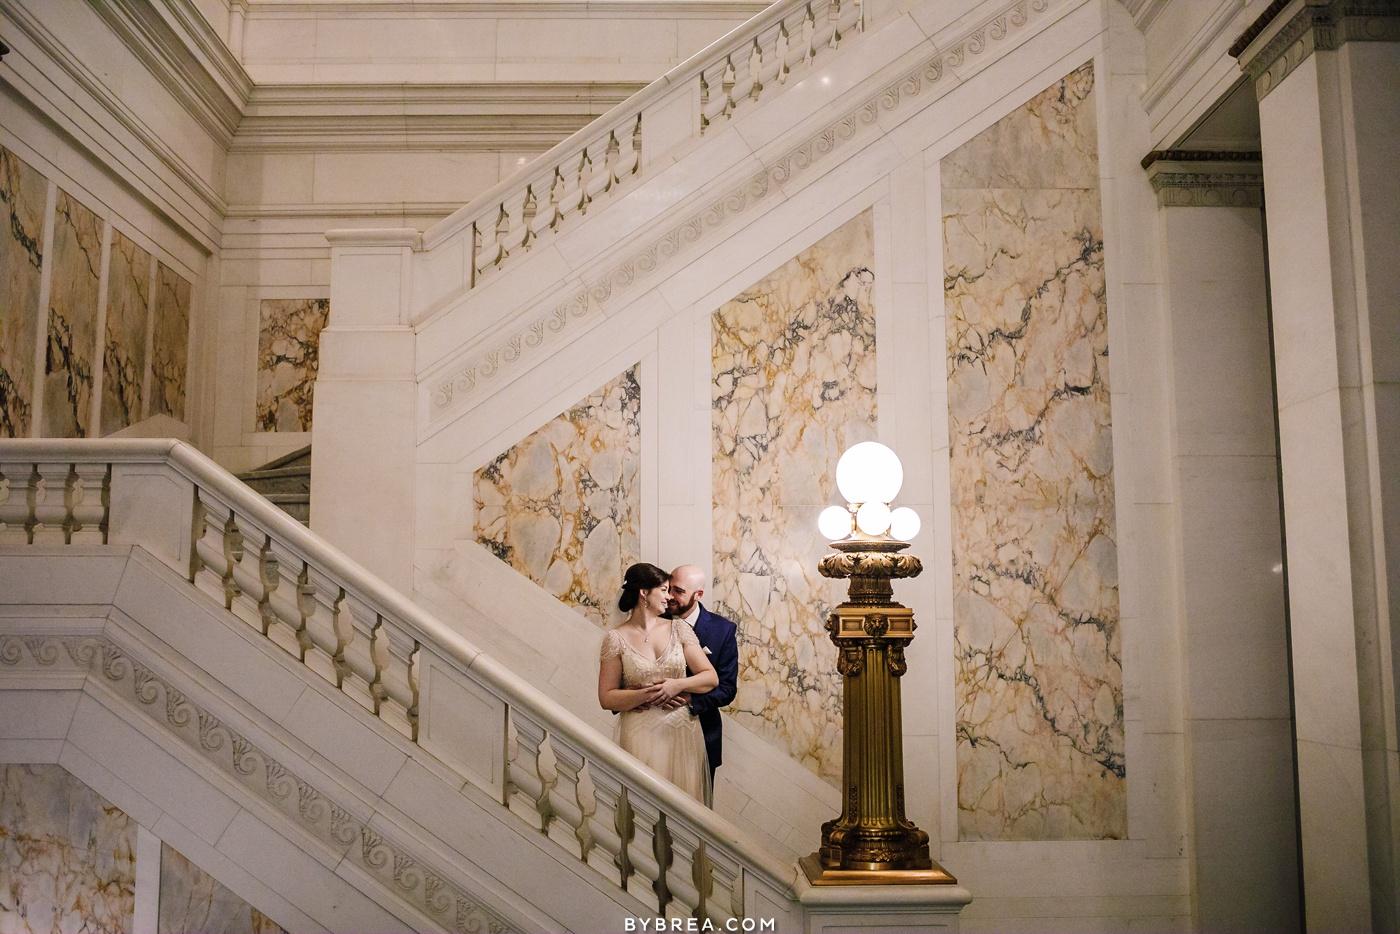 Staircase photo Hotel Monaco bride and groom portraits